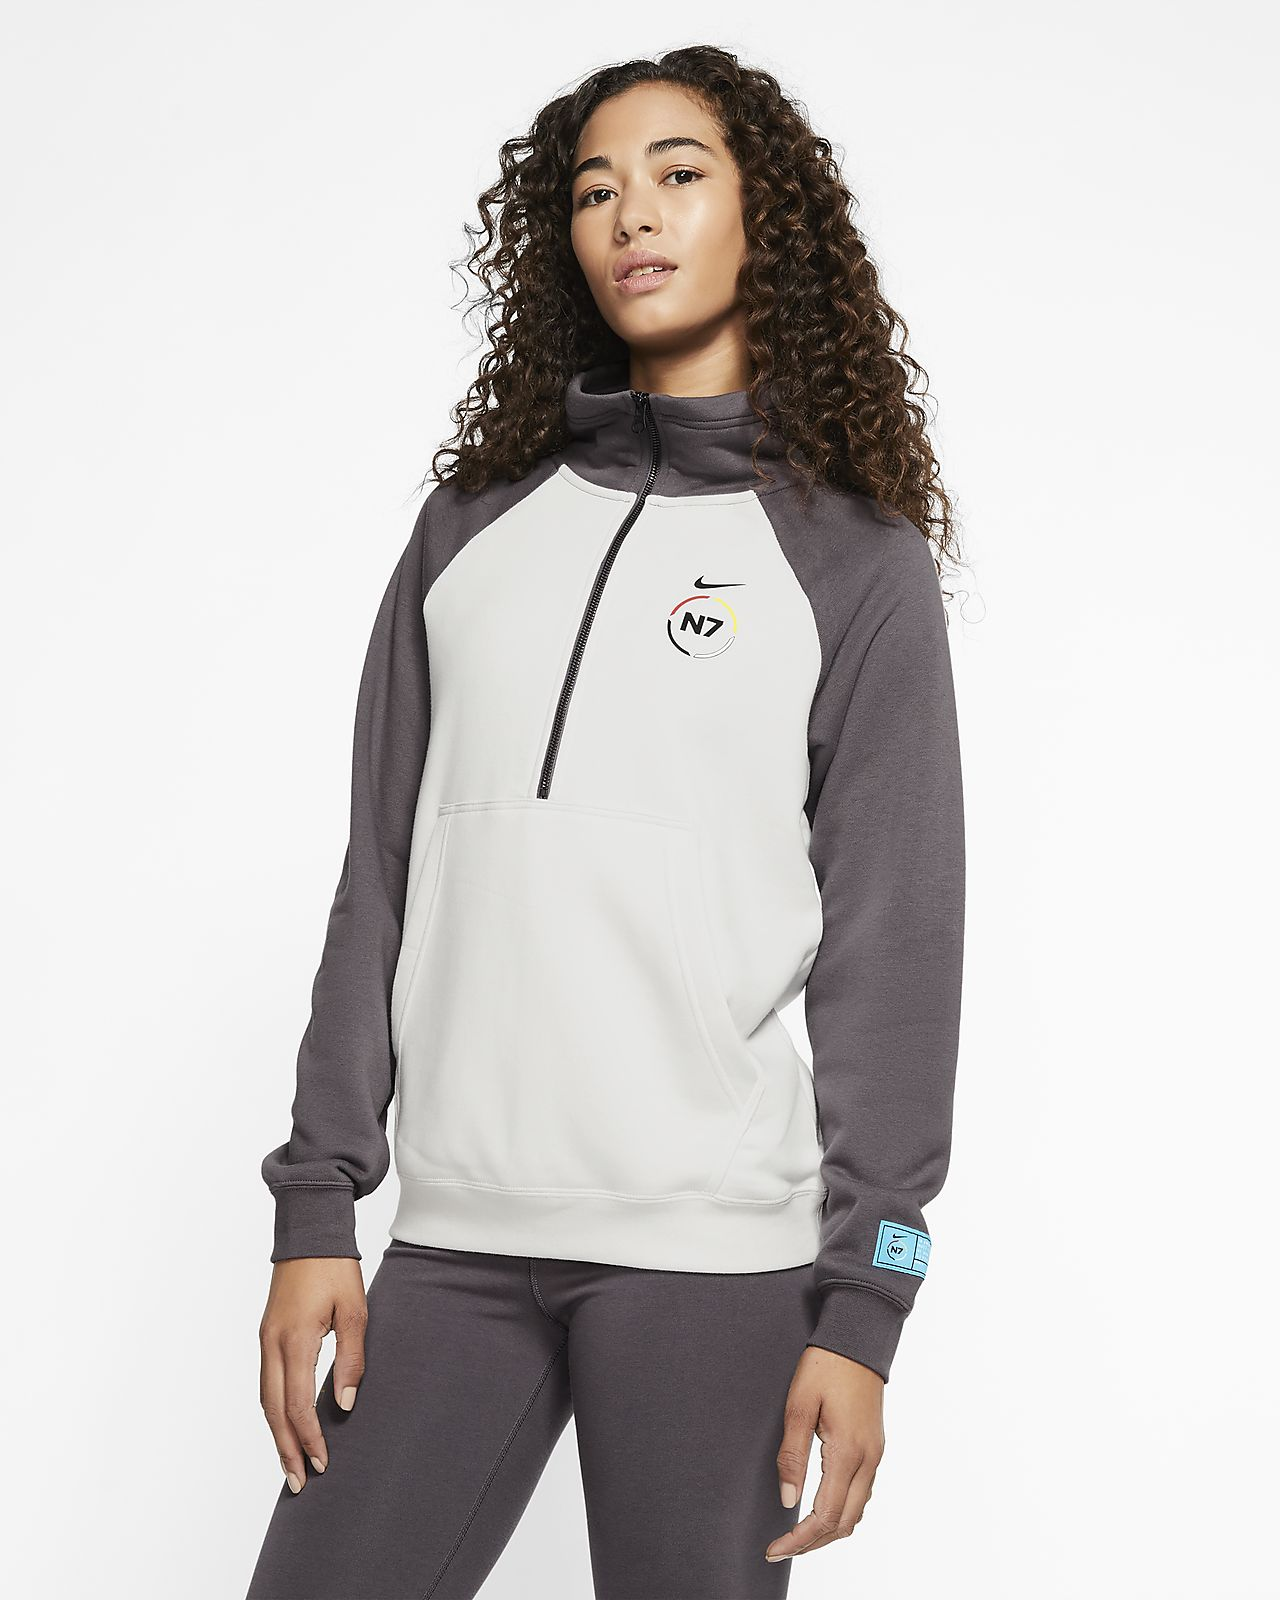 Nike Sportswear Essential N7 Women's Half-Zip Pullover